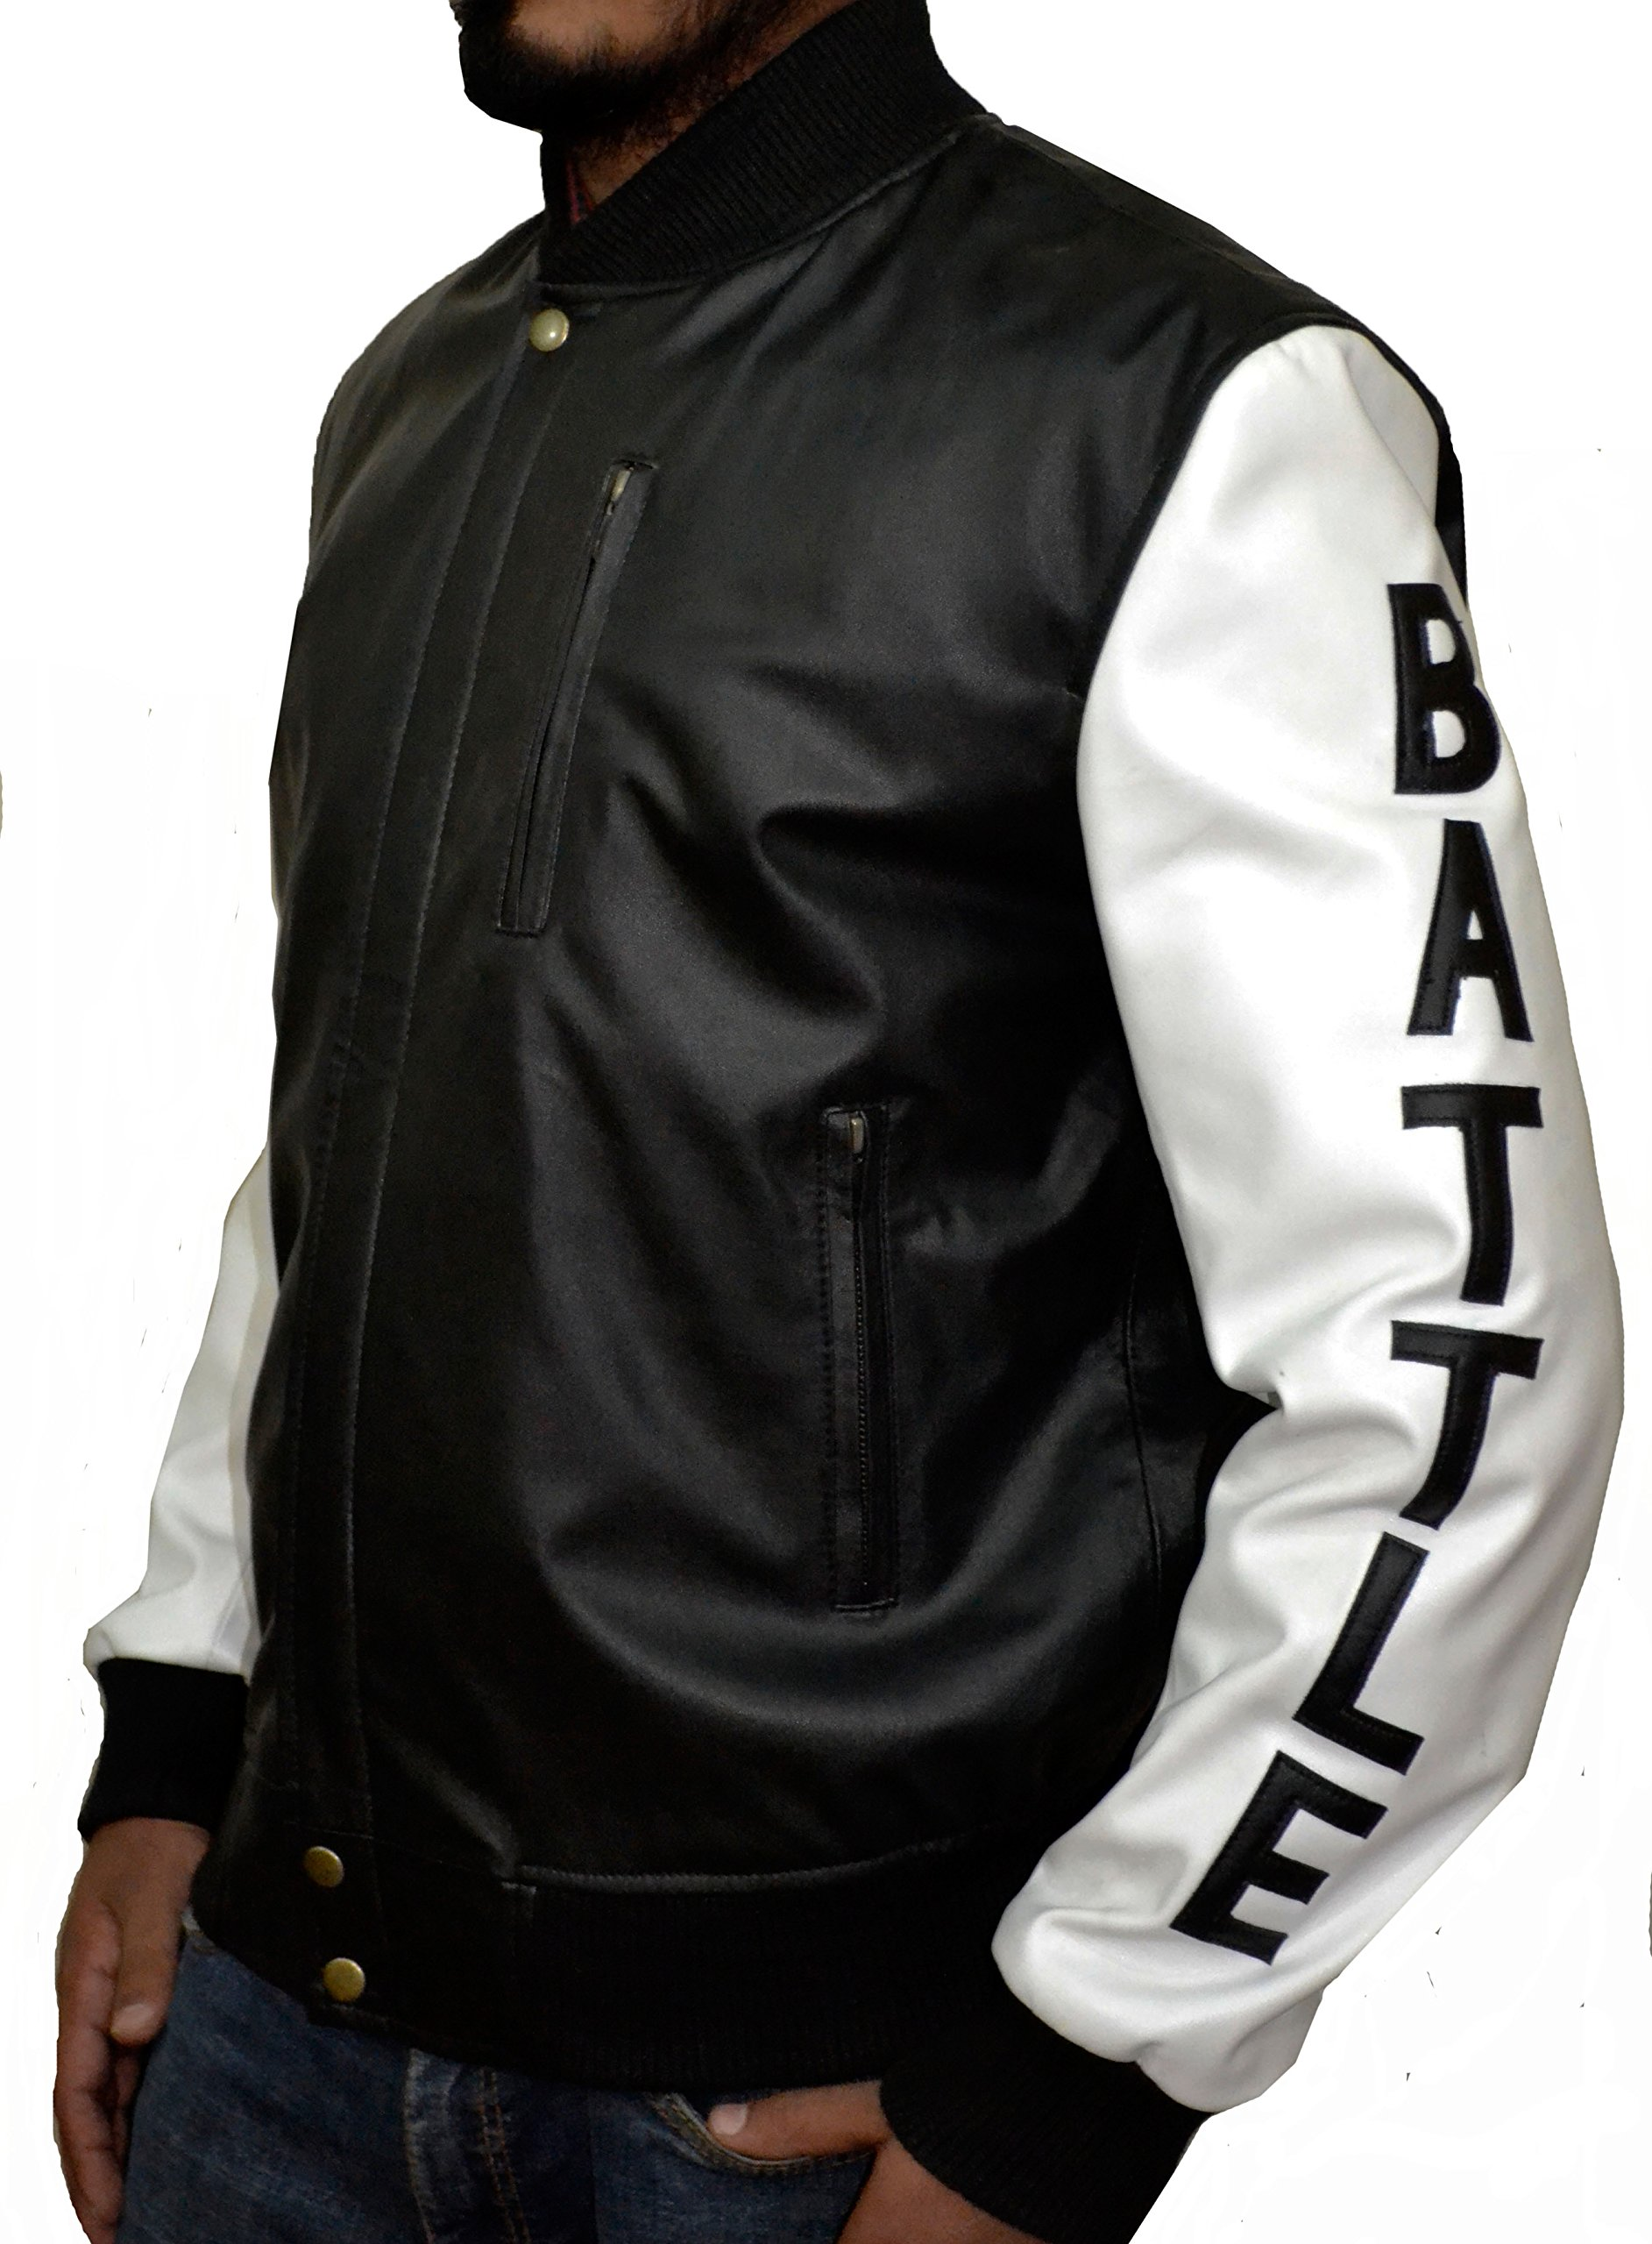 KOBE Destroyer XXIV Battle Micheal B Jordan Synthetic (Faux) Leather Jacket Black and White,XS